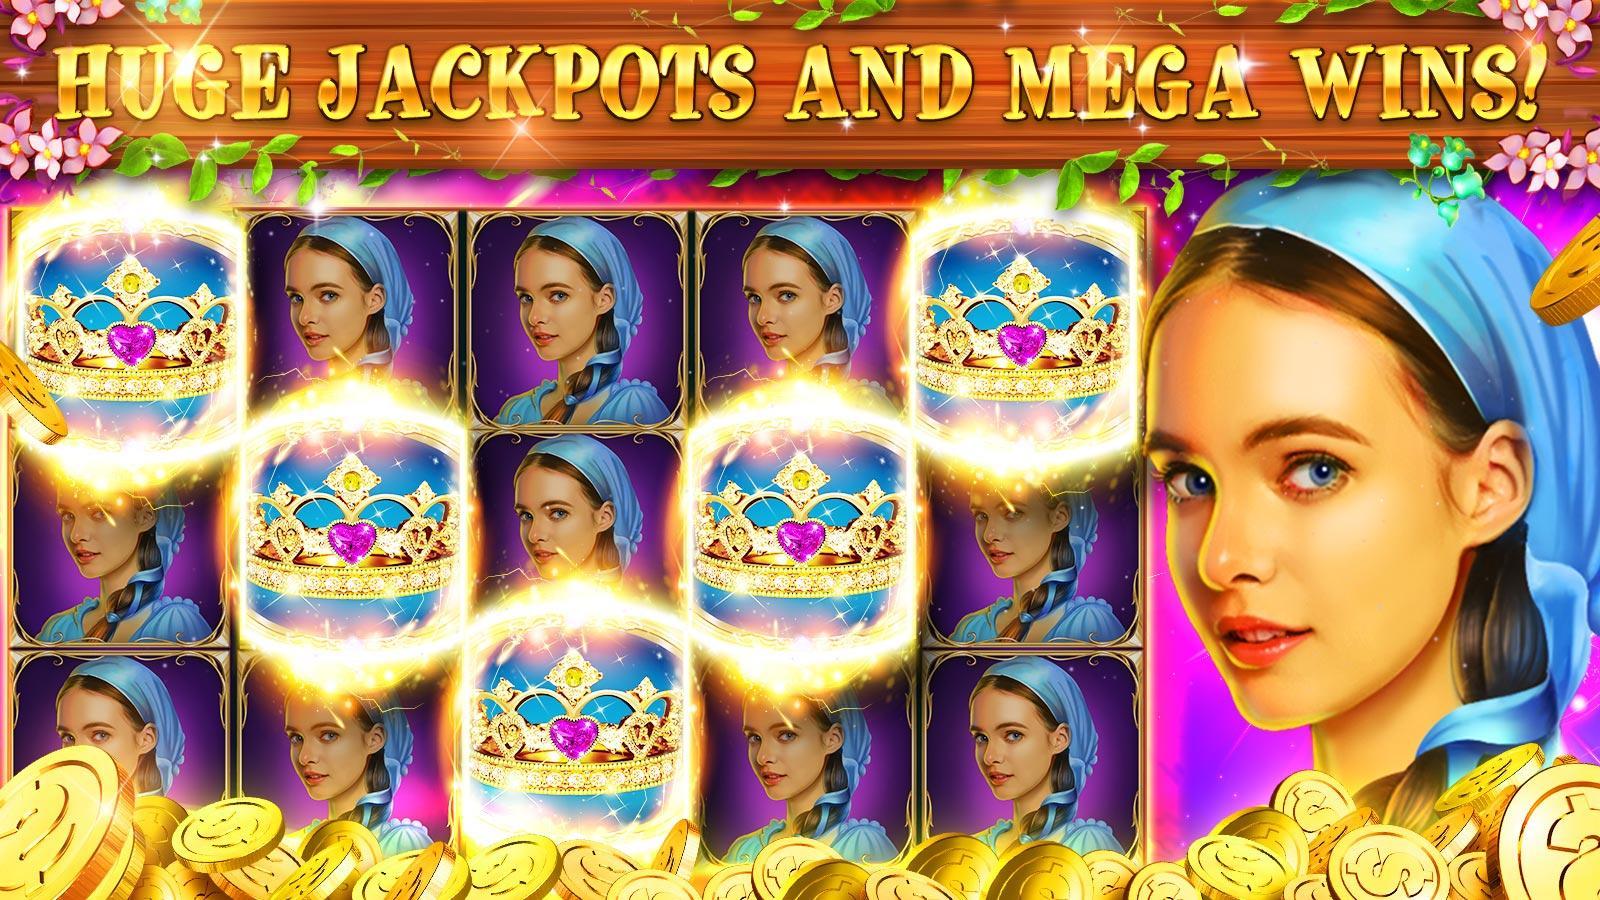 pixies slot machine free